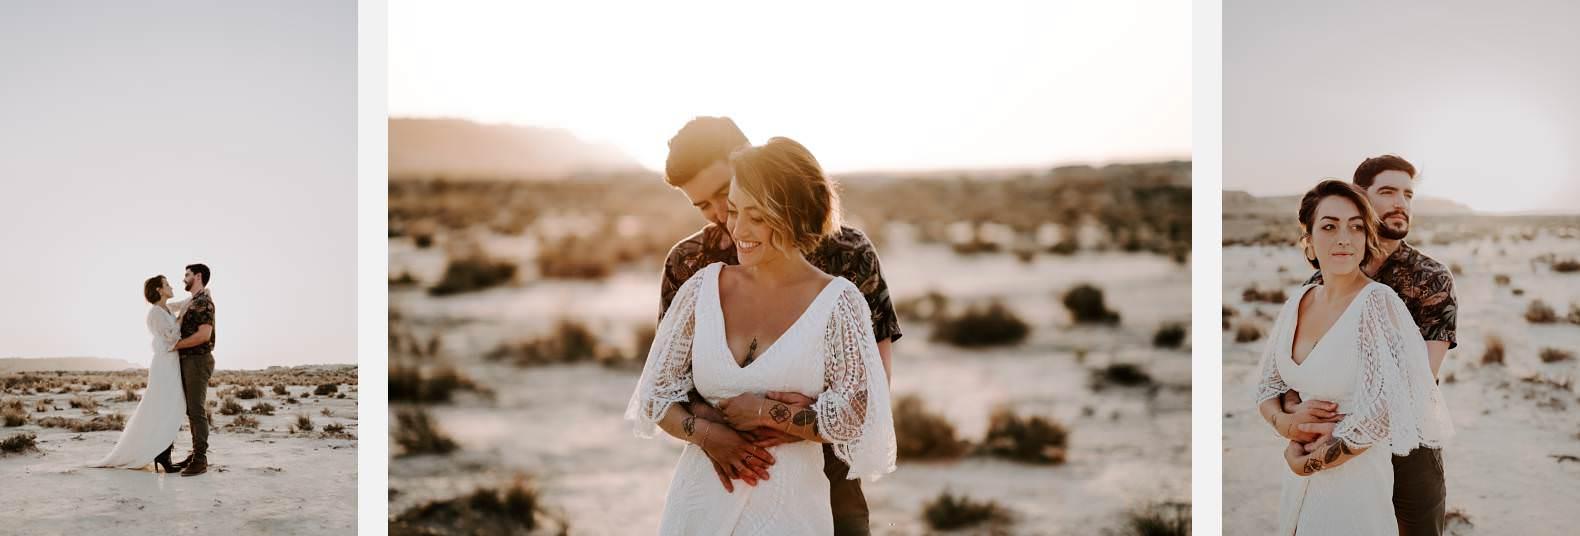 mariage espagne bardenas festival you and me elopement photographe bel esprit desert 0039